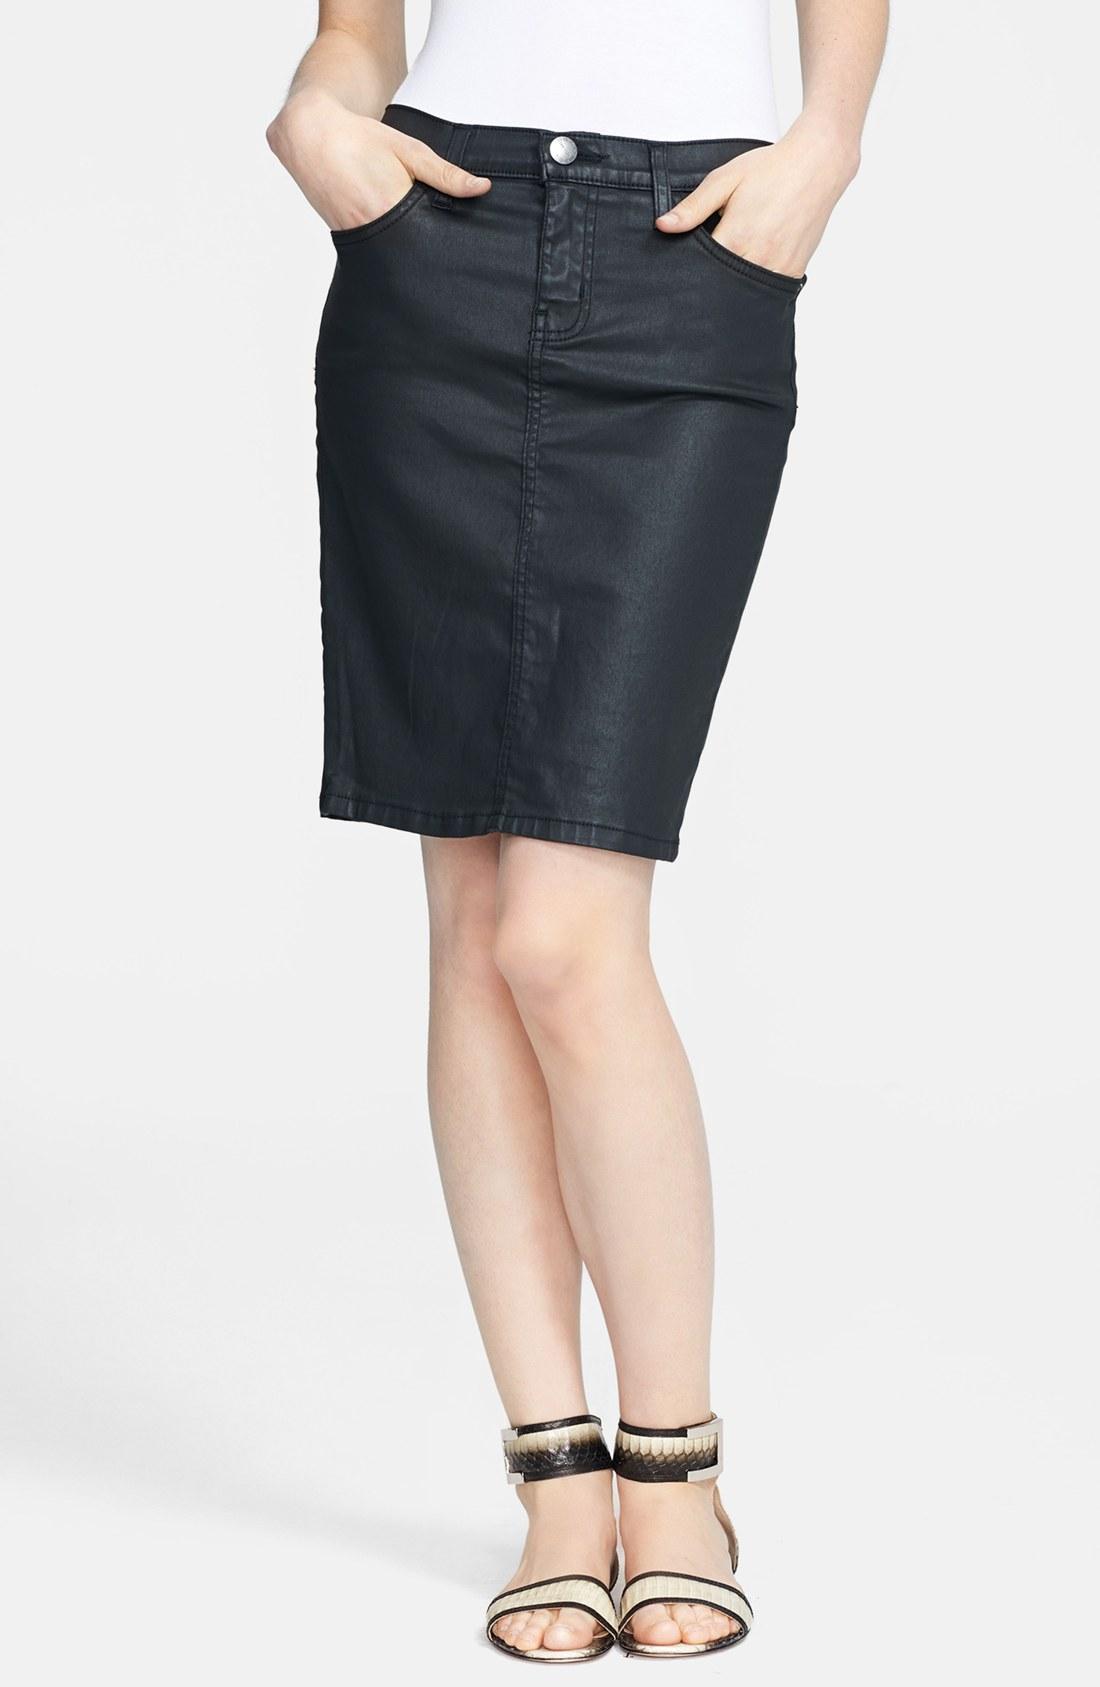 recherche patron couture jupe jean 5 poches minky gigi. Black Bedroom Furniture Sets. Home Design Ideas